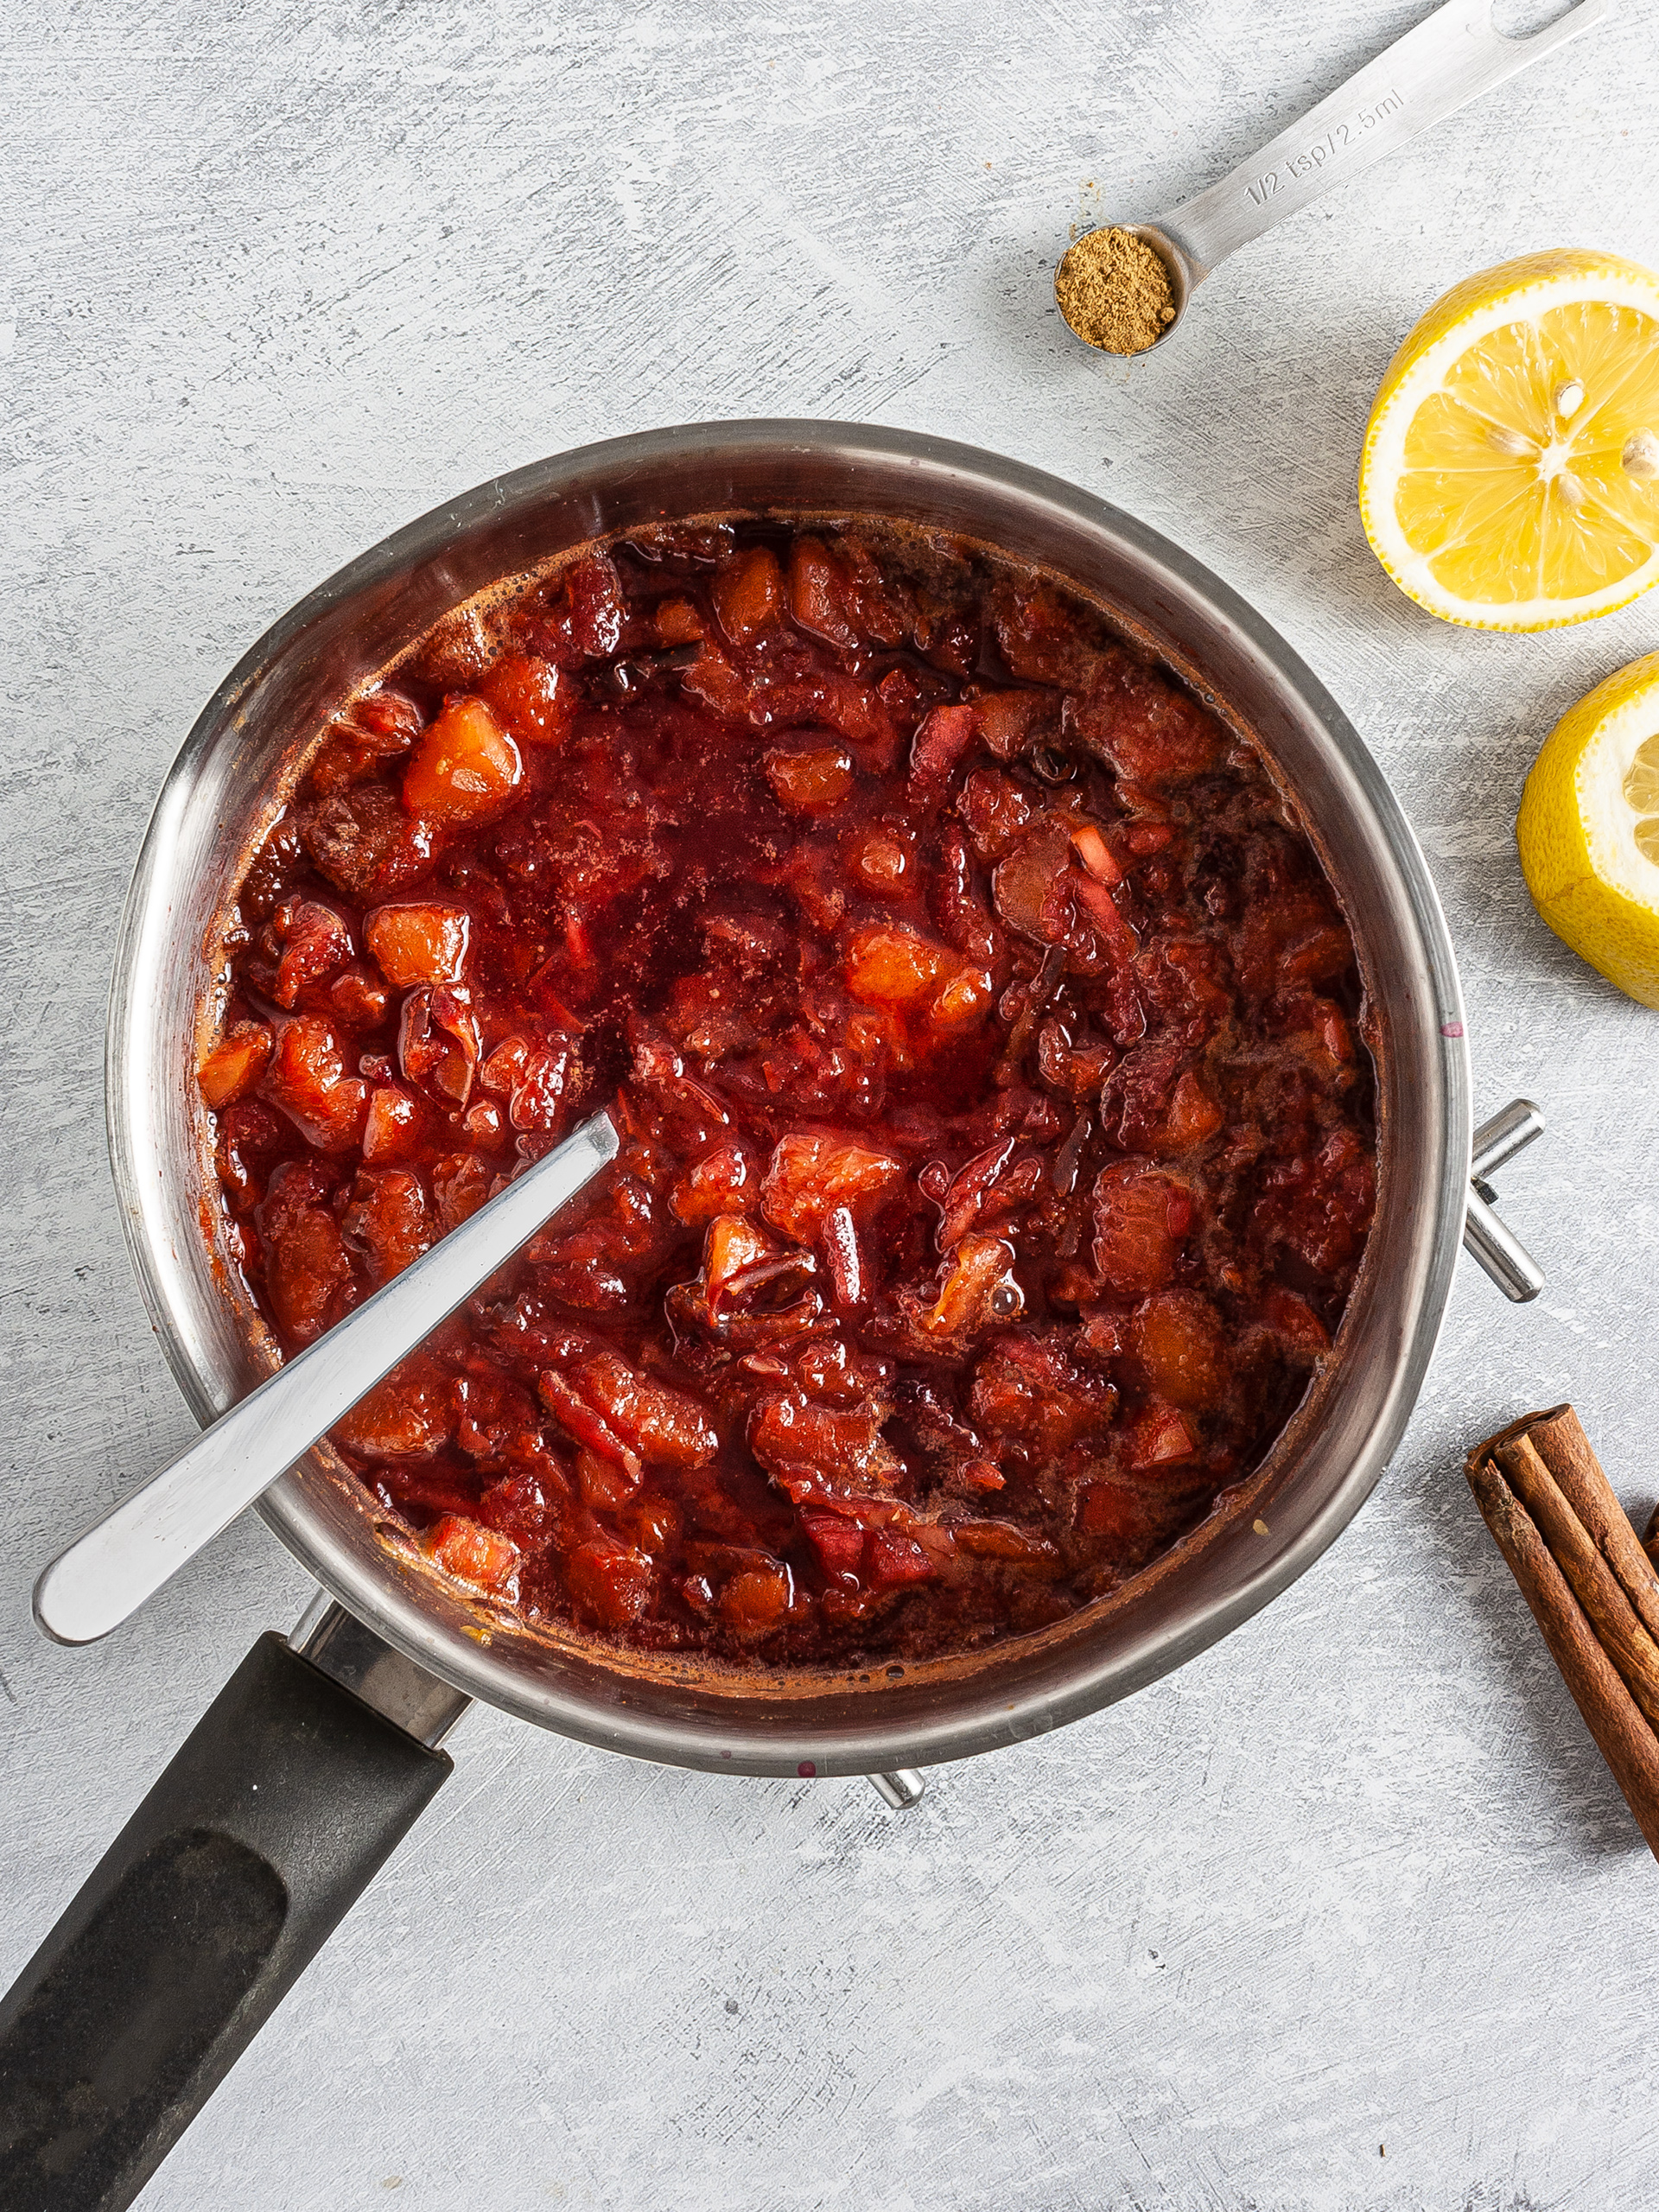 Plums, apple, cinnamon, and lemon cooking in a pan.